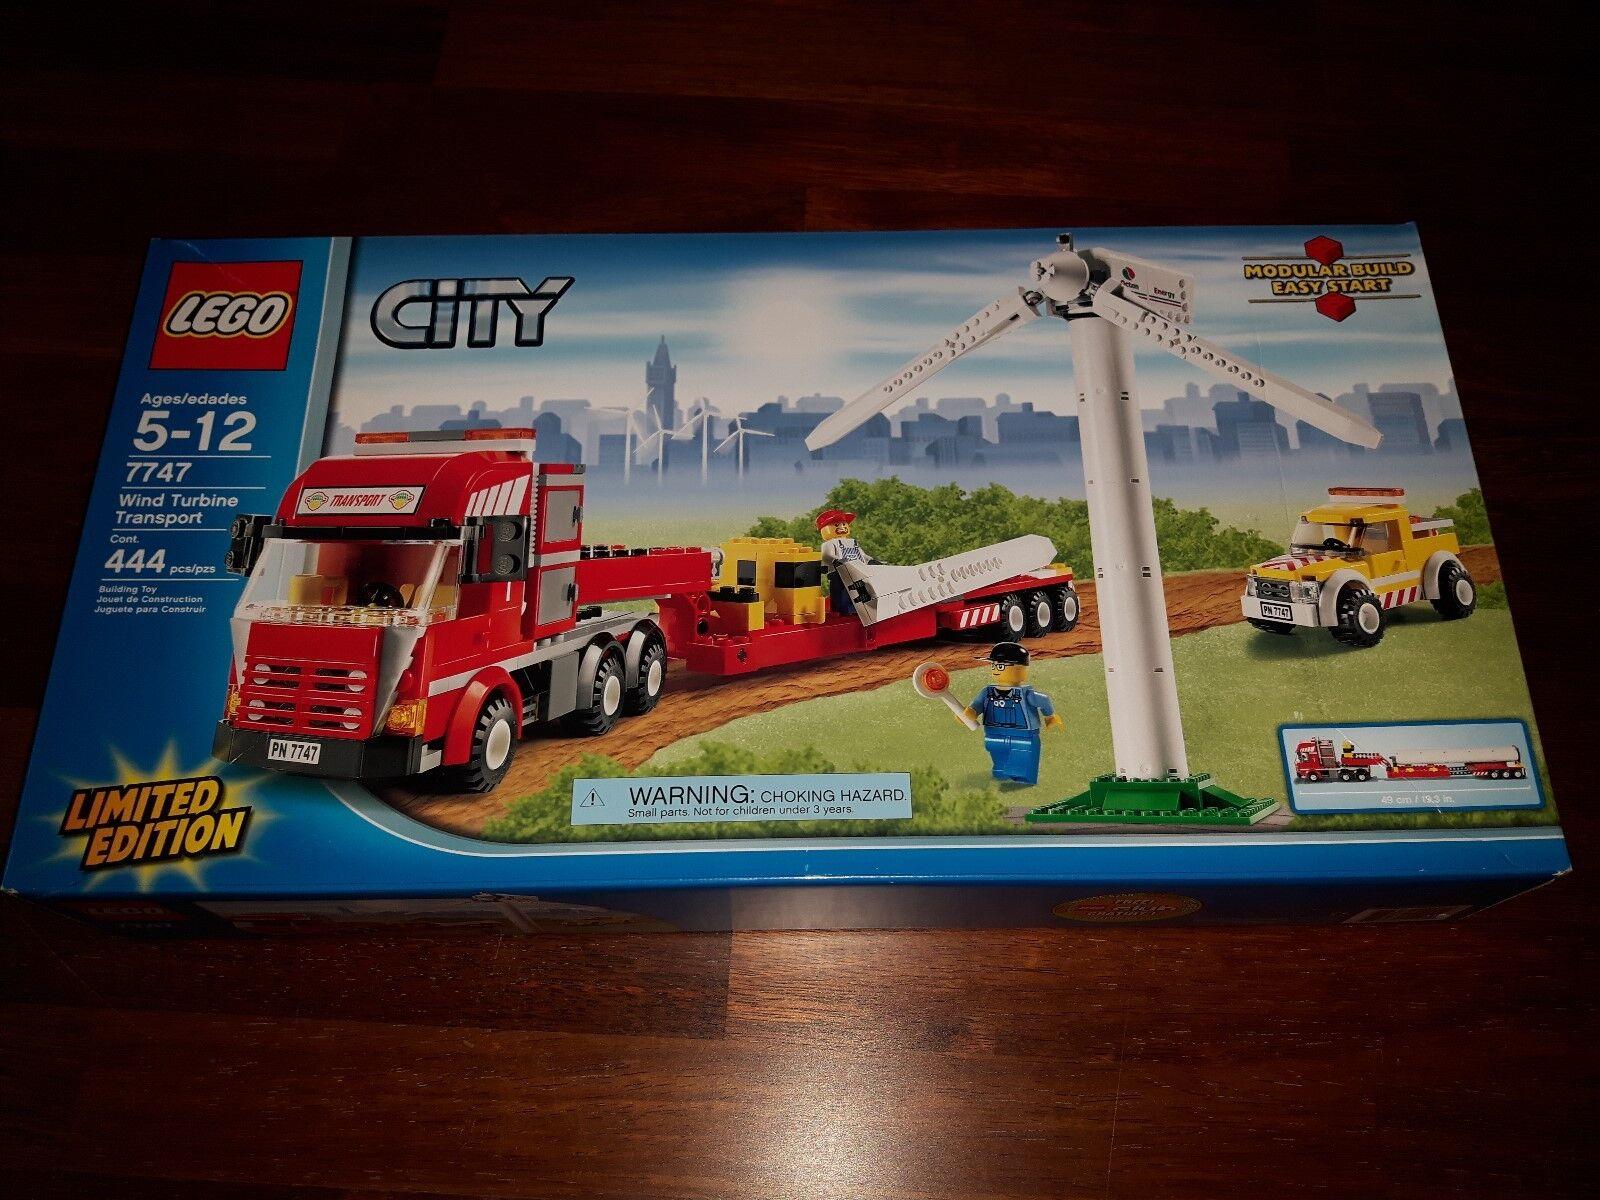 LEGO 7747 Wind Turbinen Transport Transport Transport Limited Edition sehr selten ec29f5